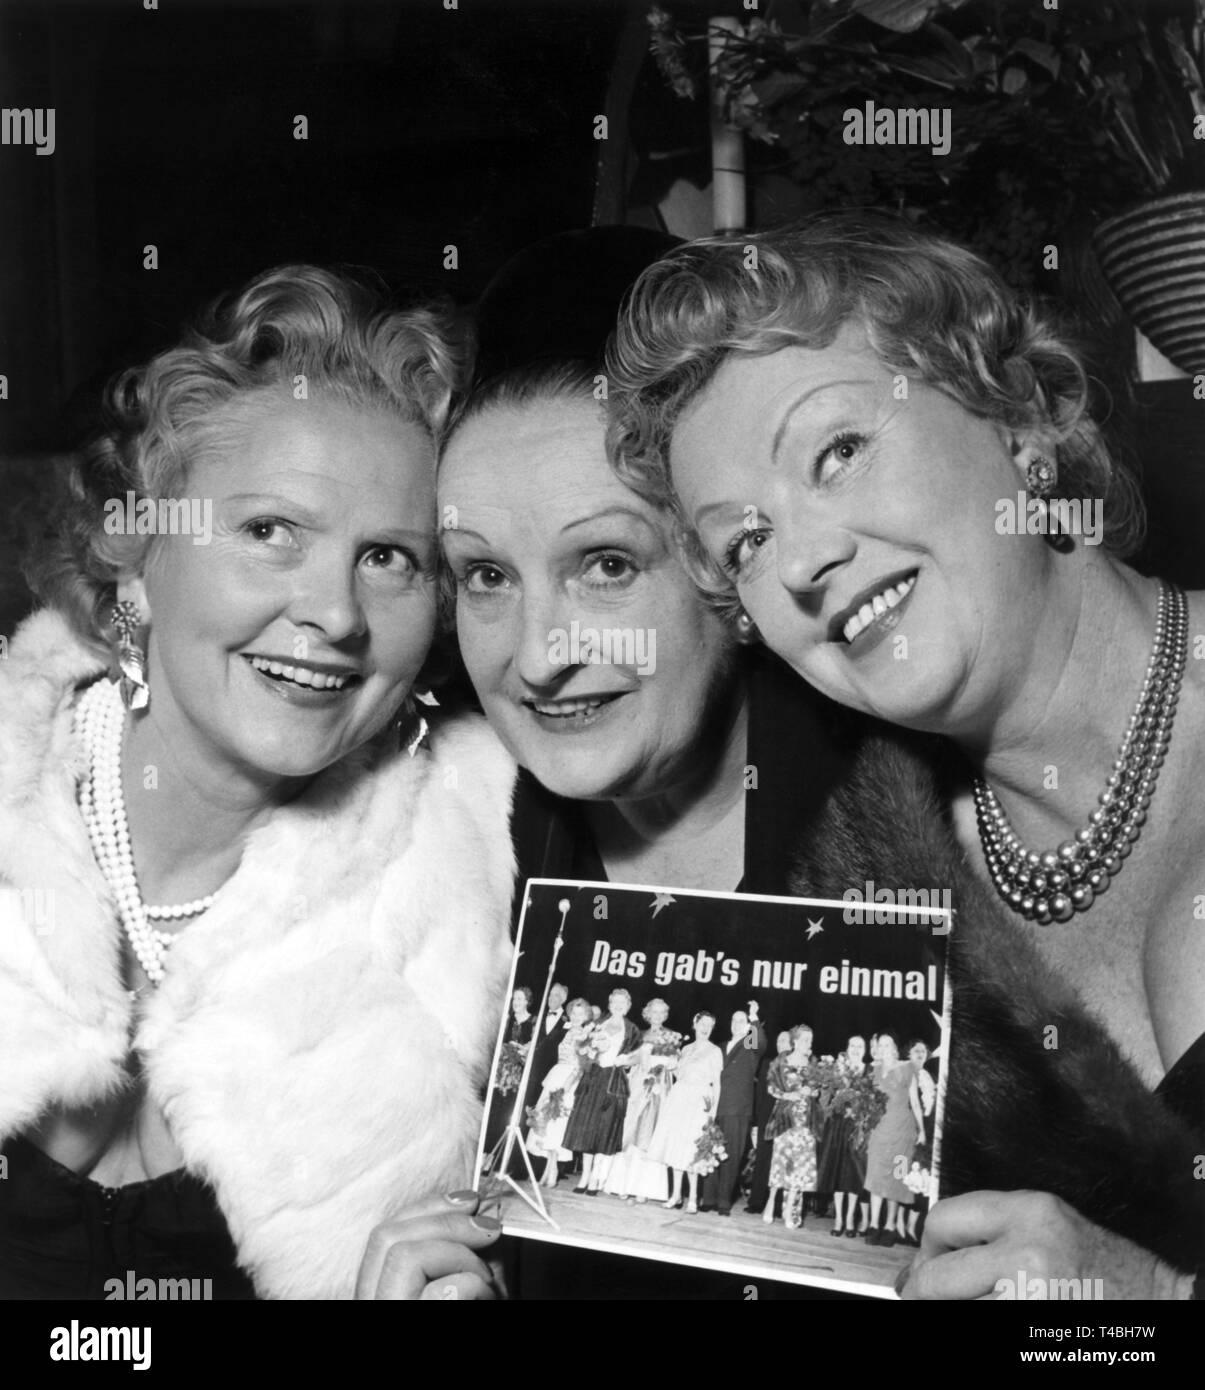 Former silent movie stars meet at the International Film Festival Berlin on 30 June 1956 (l-r): Liane Haid, Fern Andra and Gretl Theimer.   usage worldwide - Stock Image